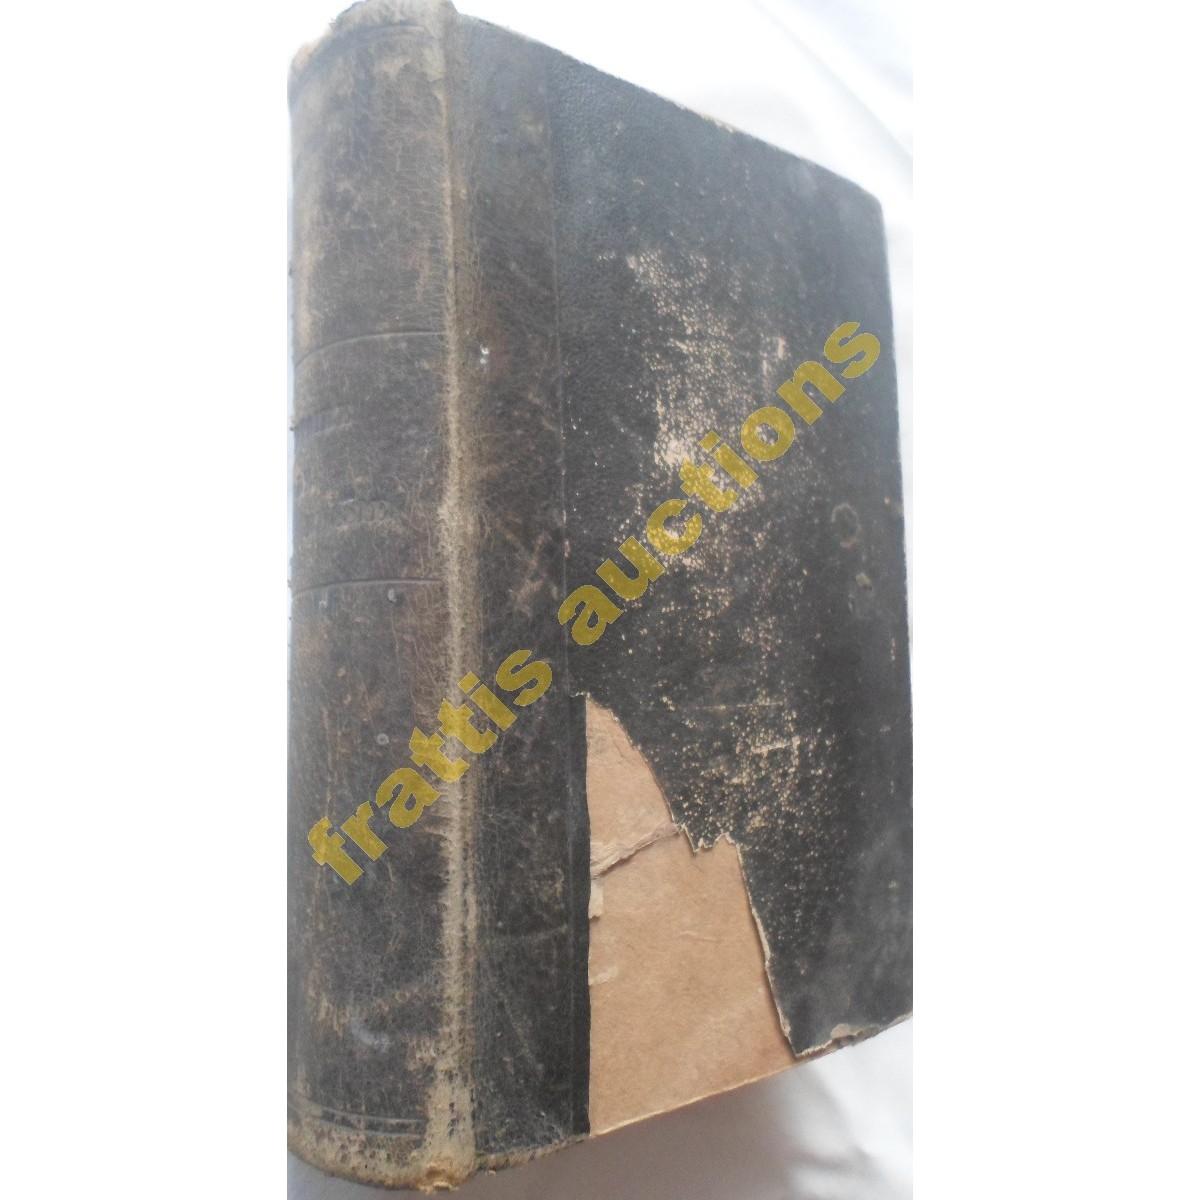 Alfred Rambaud, Histoire de la Russie, Paris 1878, 1η έκδοση